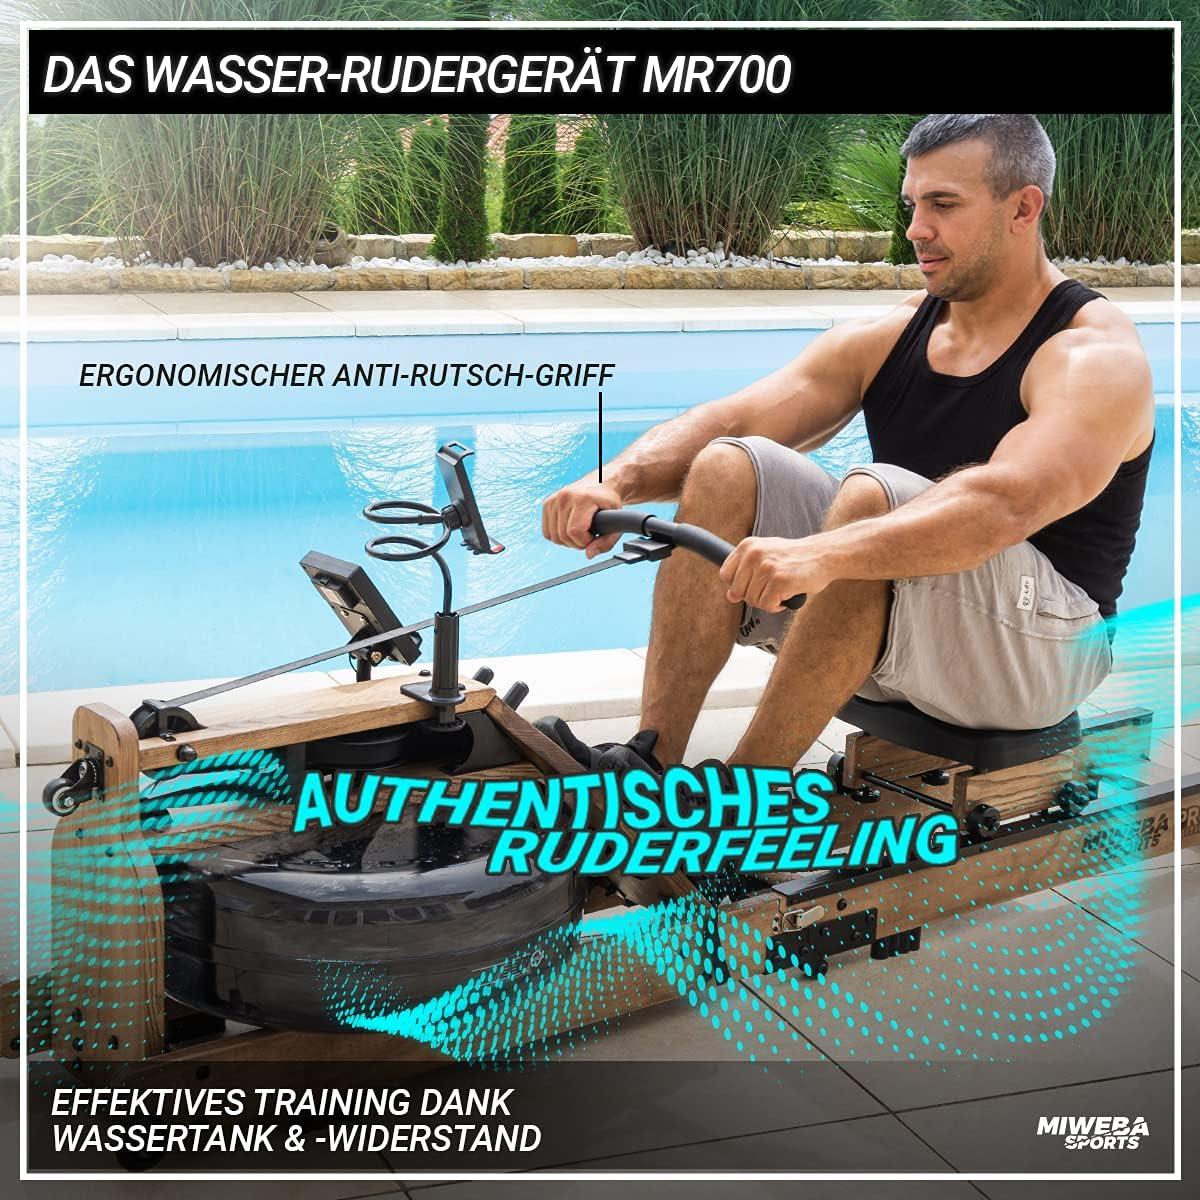 Miweba Sports WR700 Wasser Rudergerät Rudergefühl